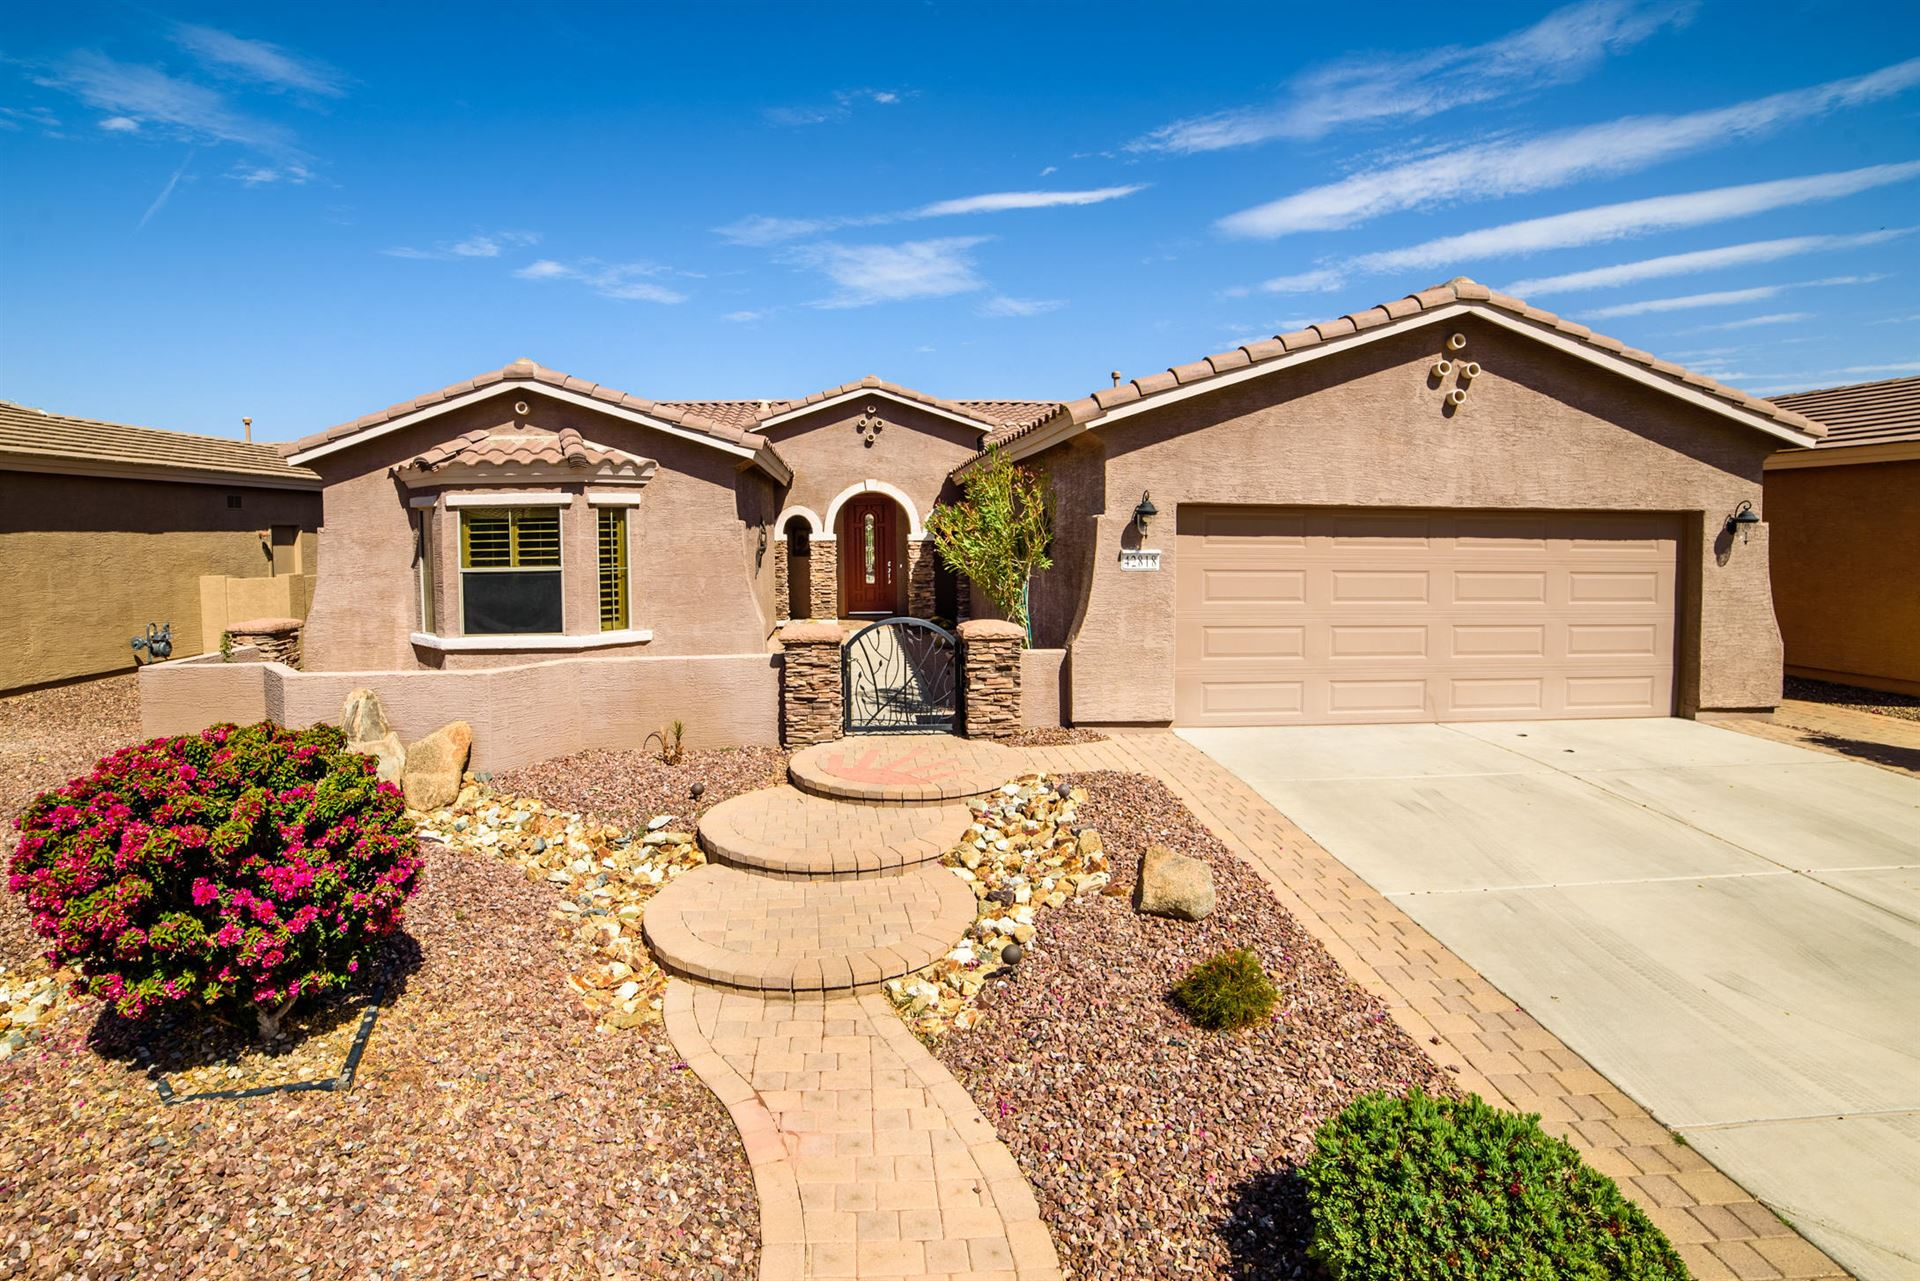 42818 W OCEAN BREEZE Drive, Maricopa, AZ 85138 - MLS#: 6215144